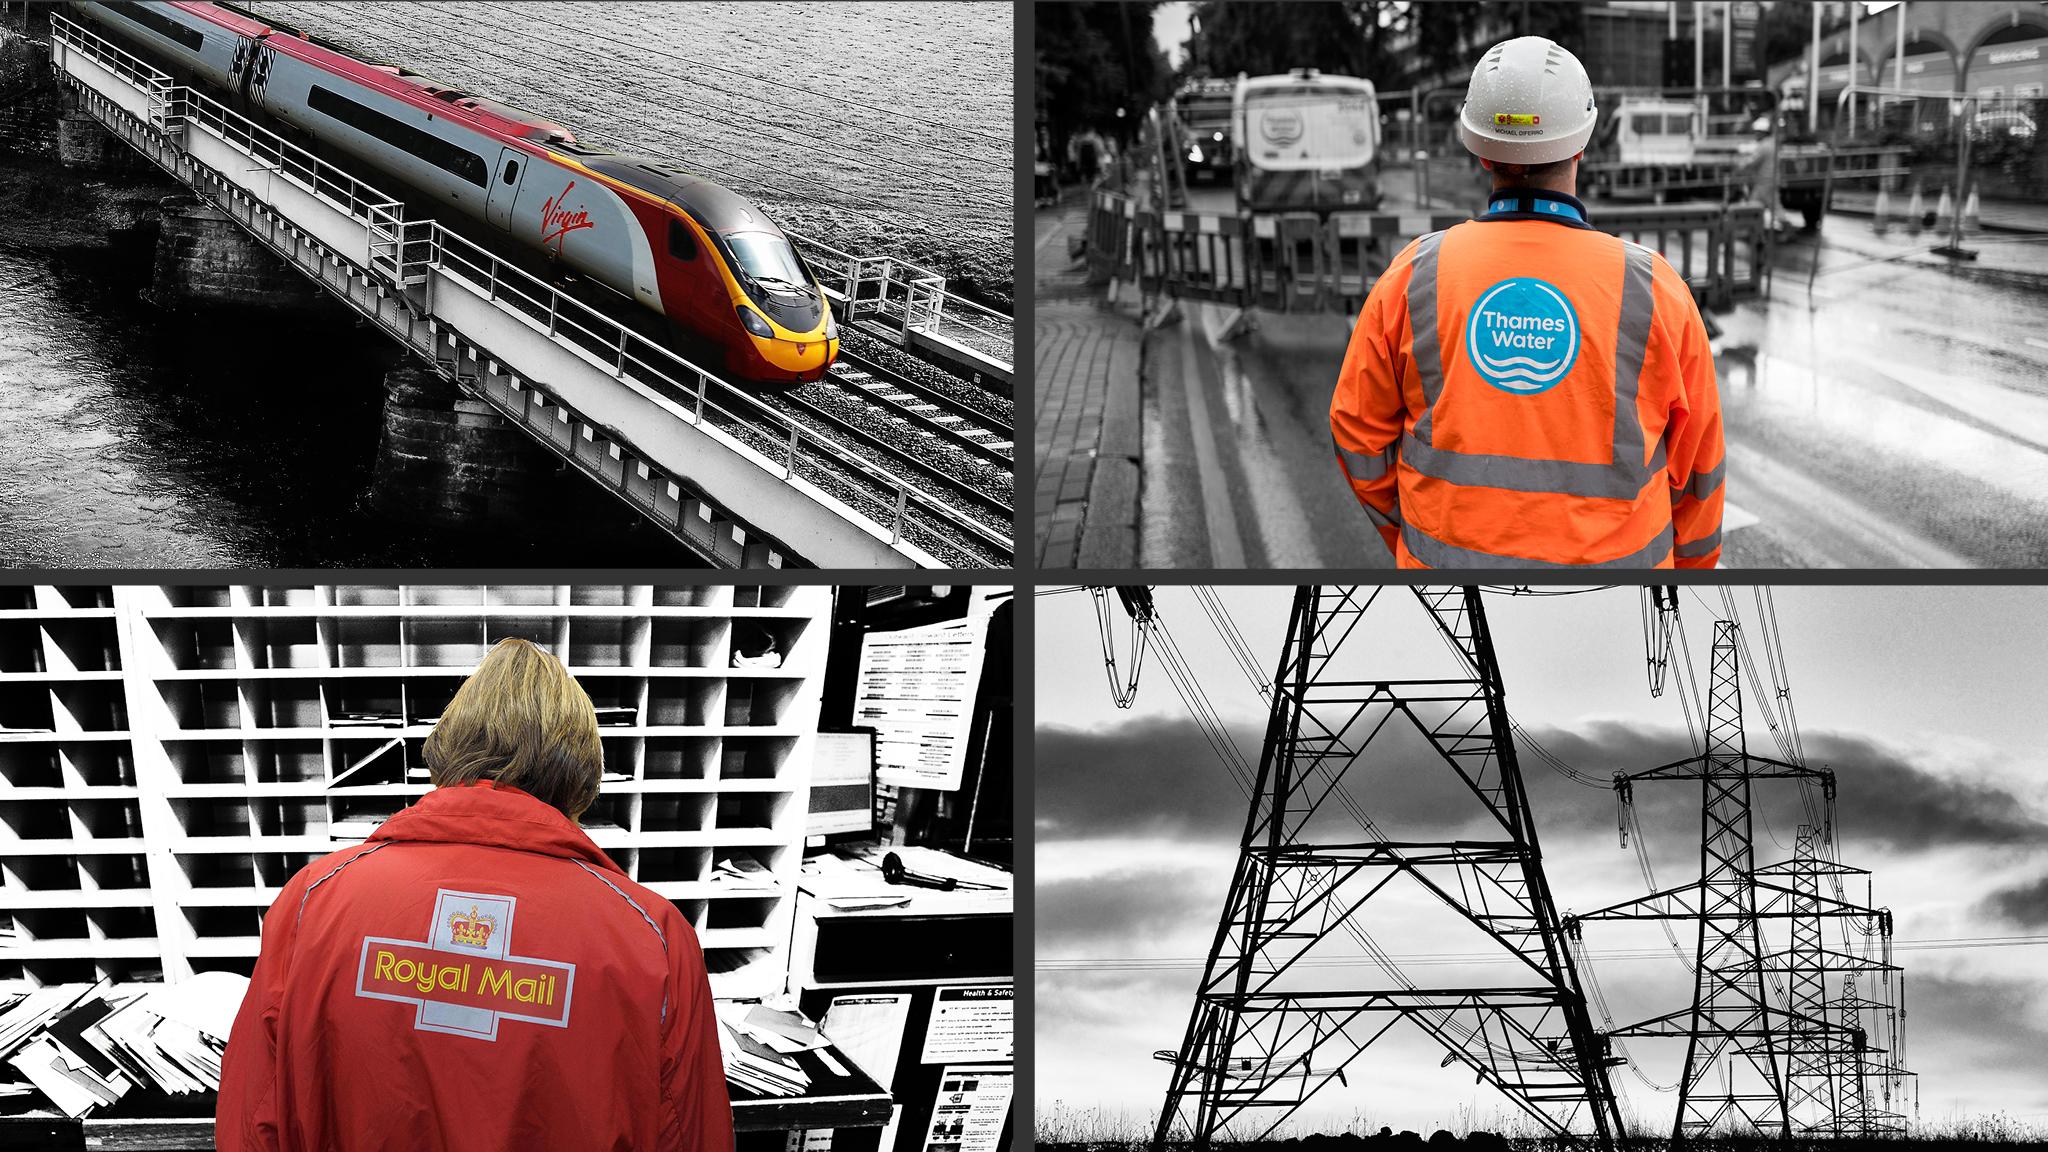 The privatisation debate: Britain rethinks how to run its utilities